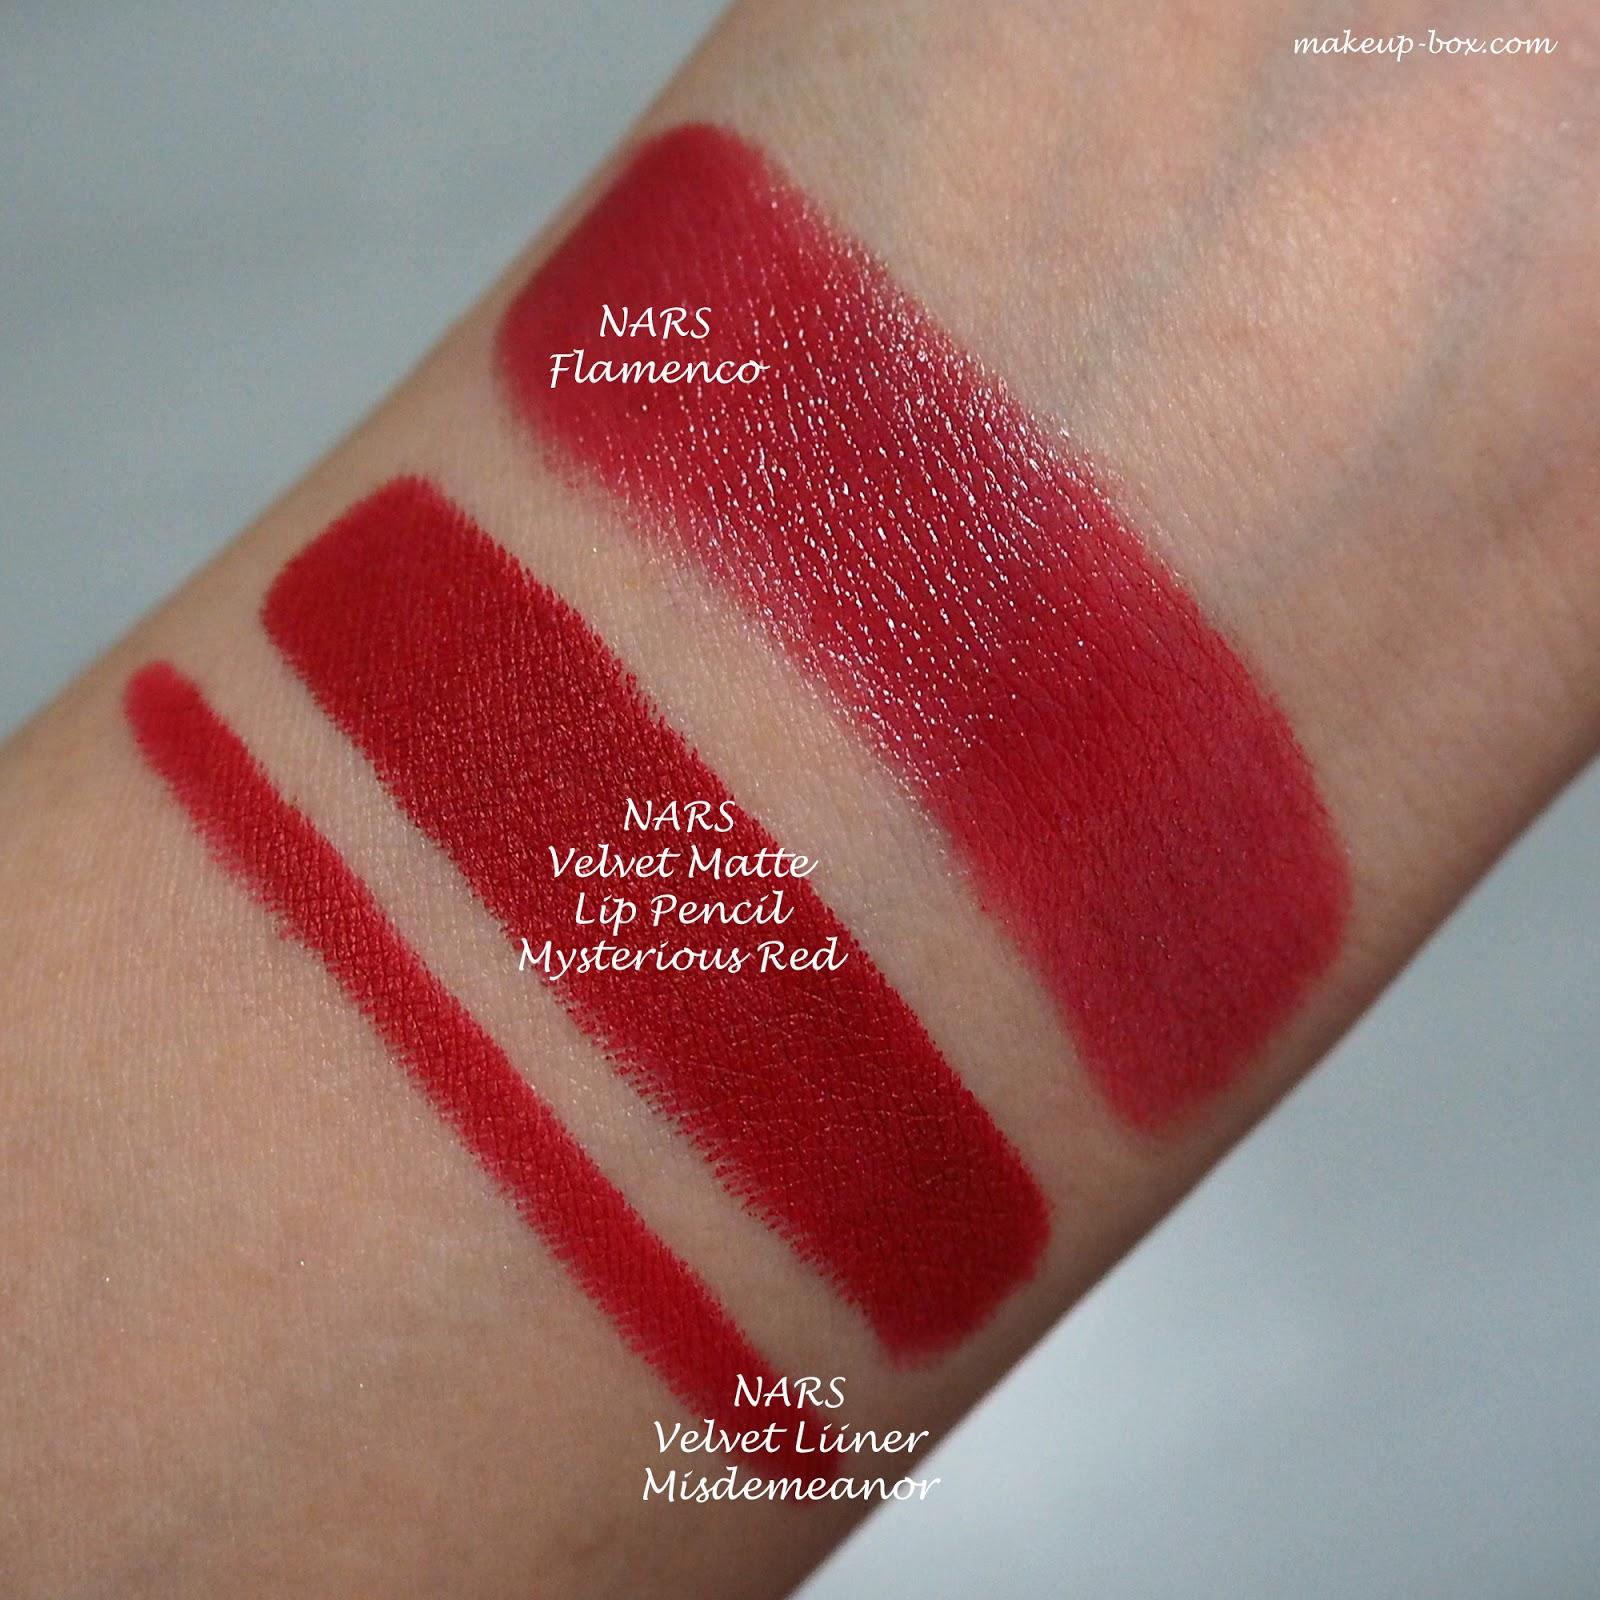 Nars Velvet Matte Lip Pencil The Makeup Box: Some N...